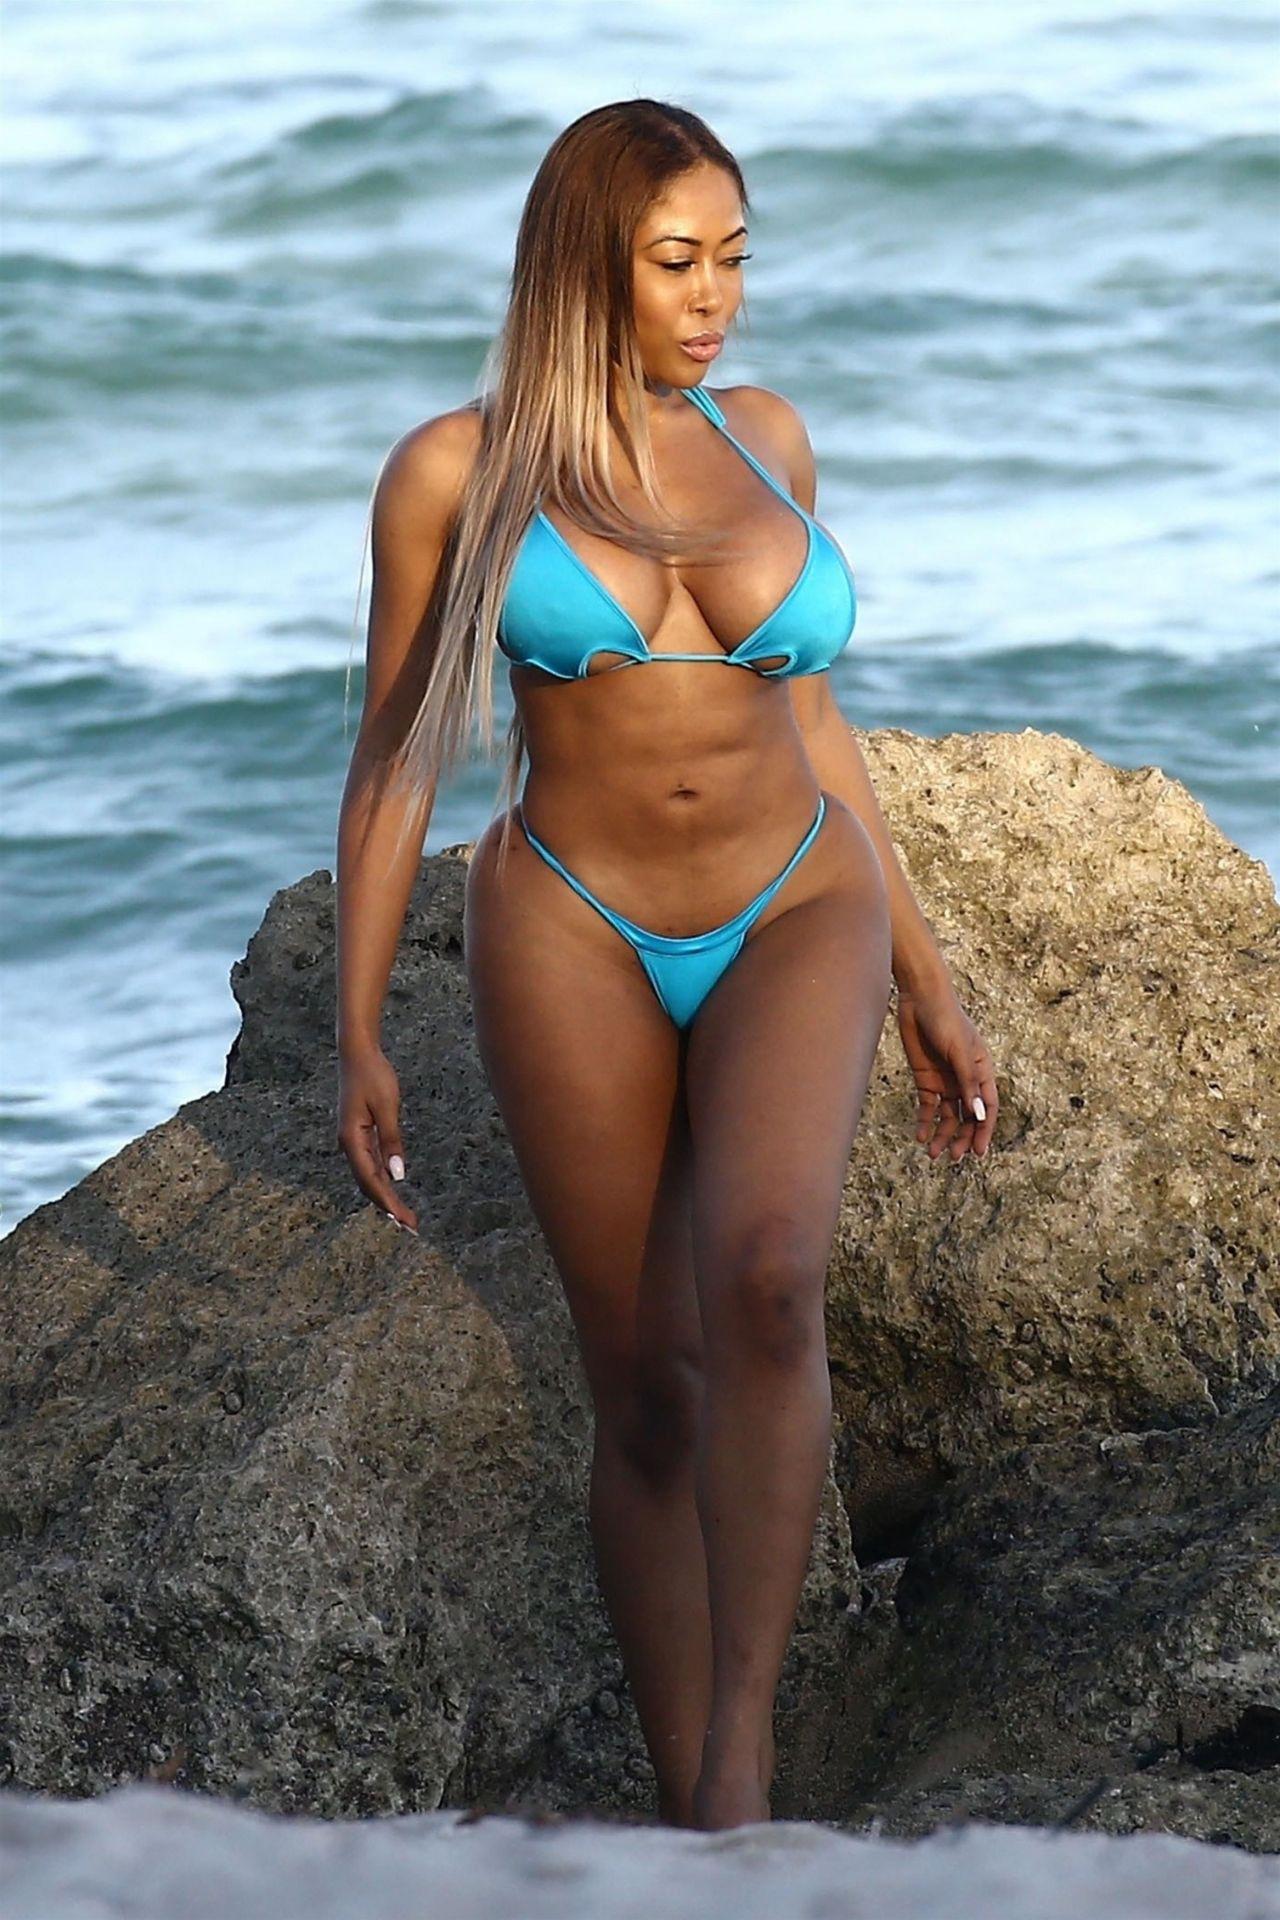 Moriah Mills in Bikini Photoshoot on the beach in Miami Pic 15 of 35